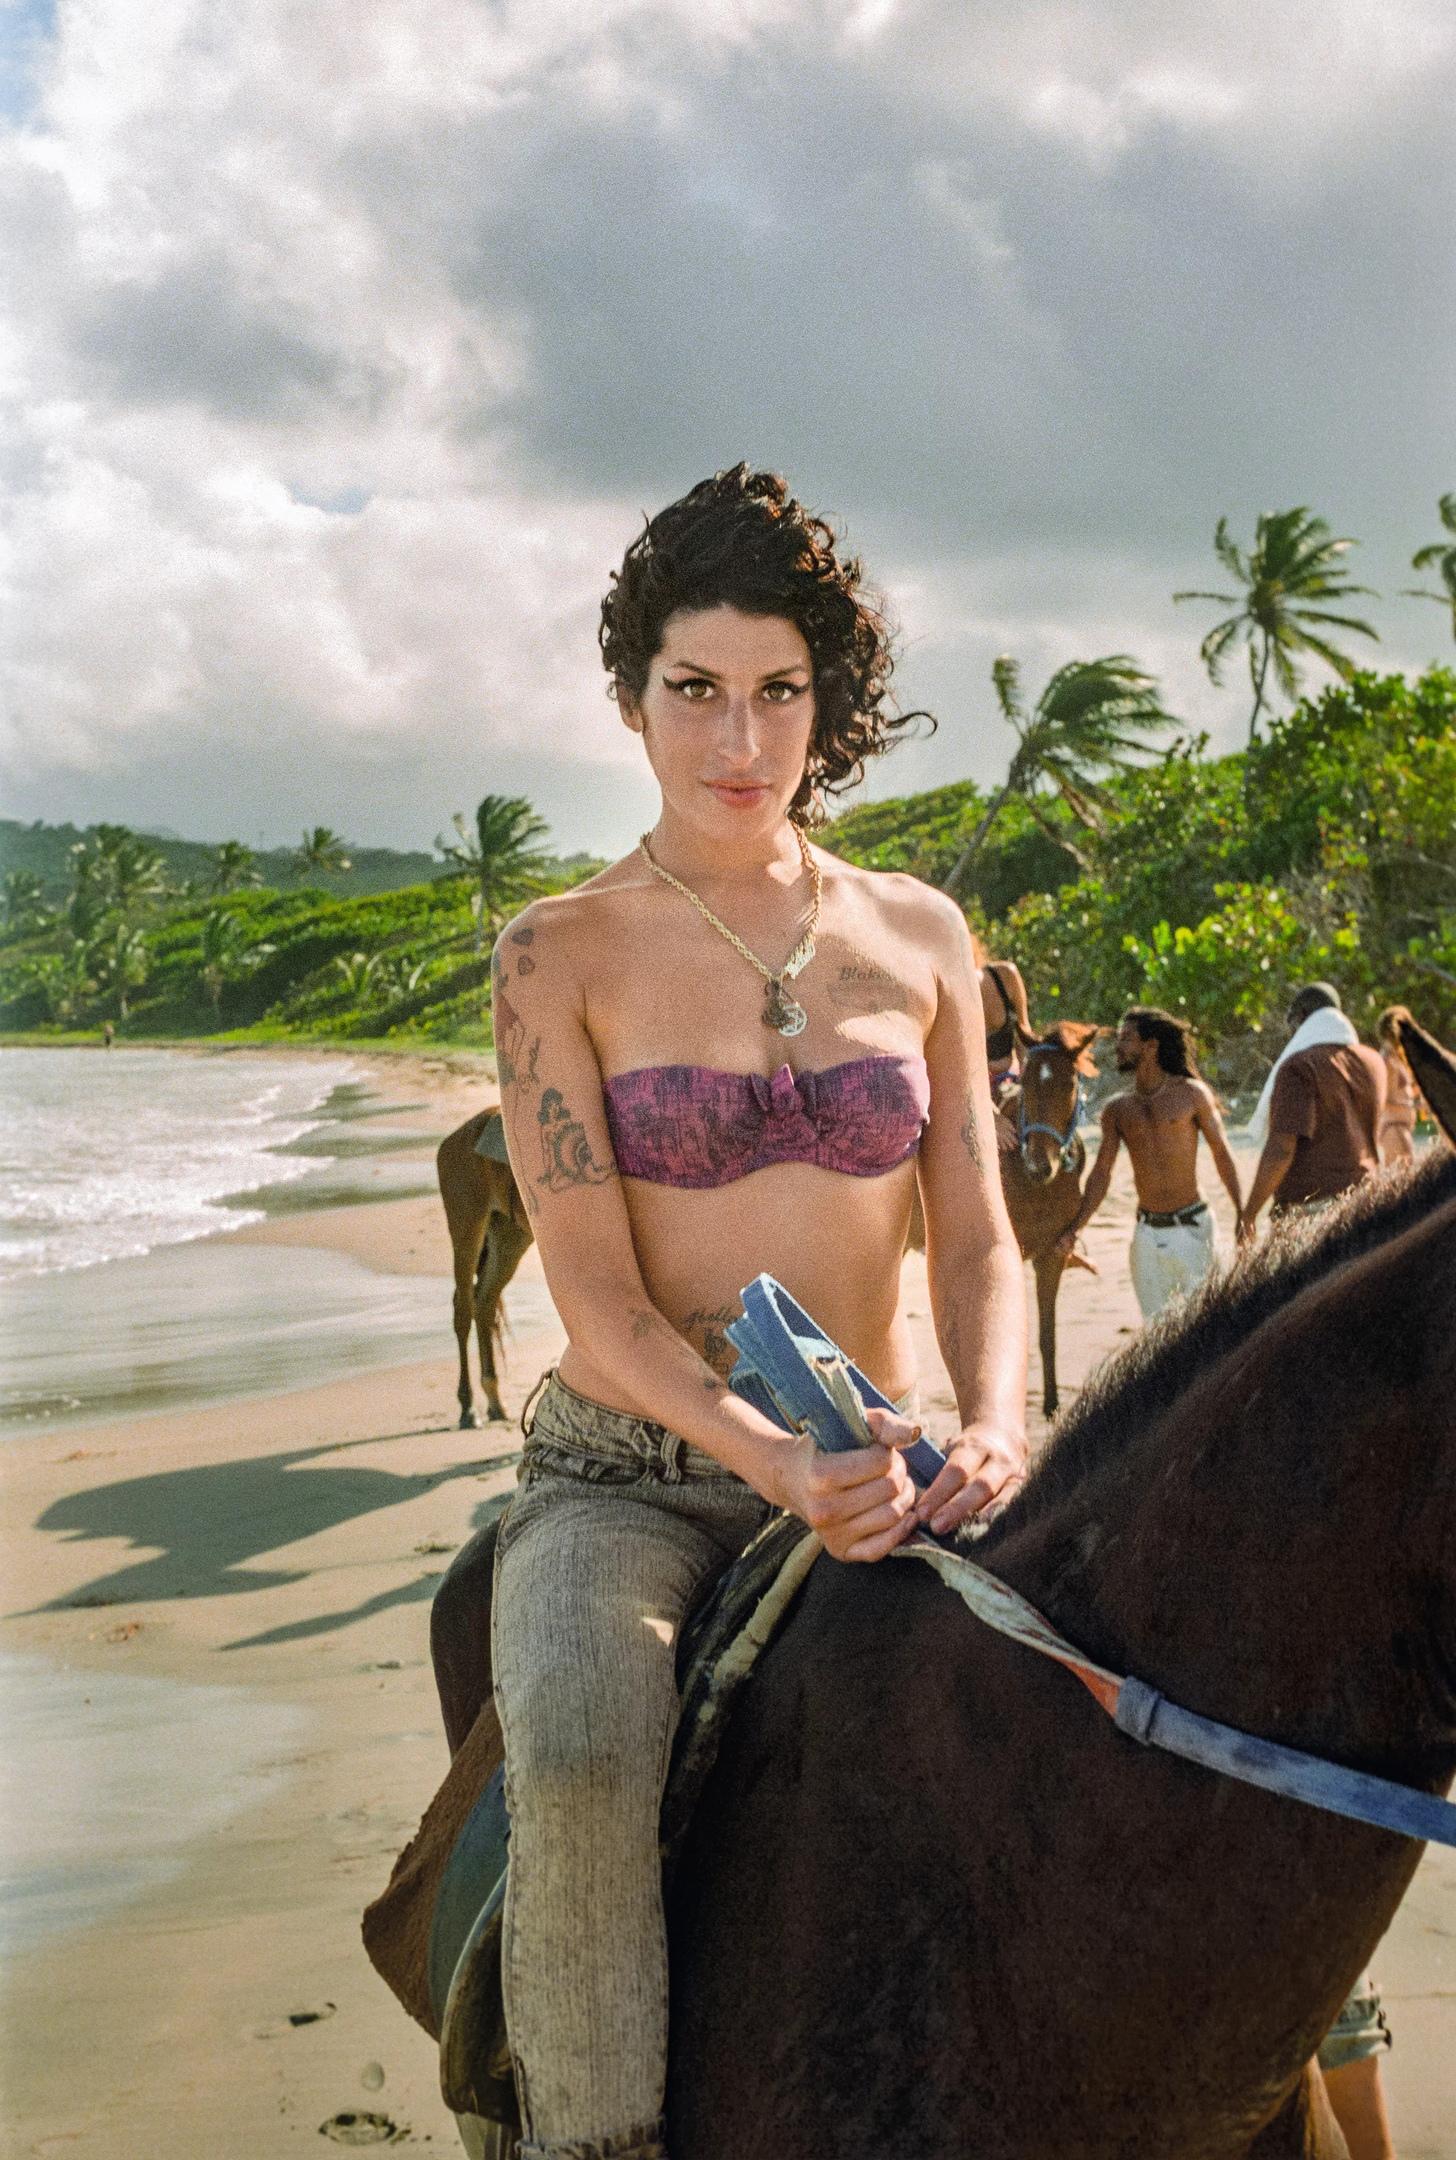 В книгу Amy Winehouse by Blake Wood войдут неизданные снимки певицы